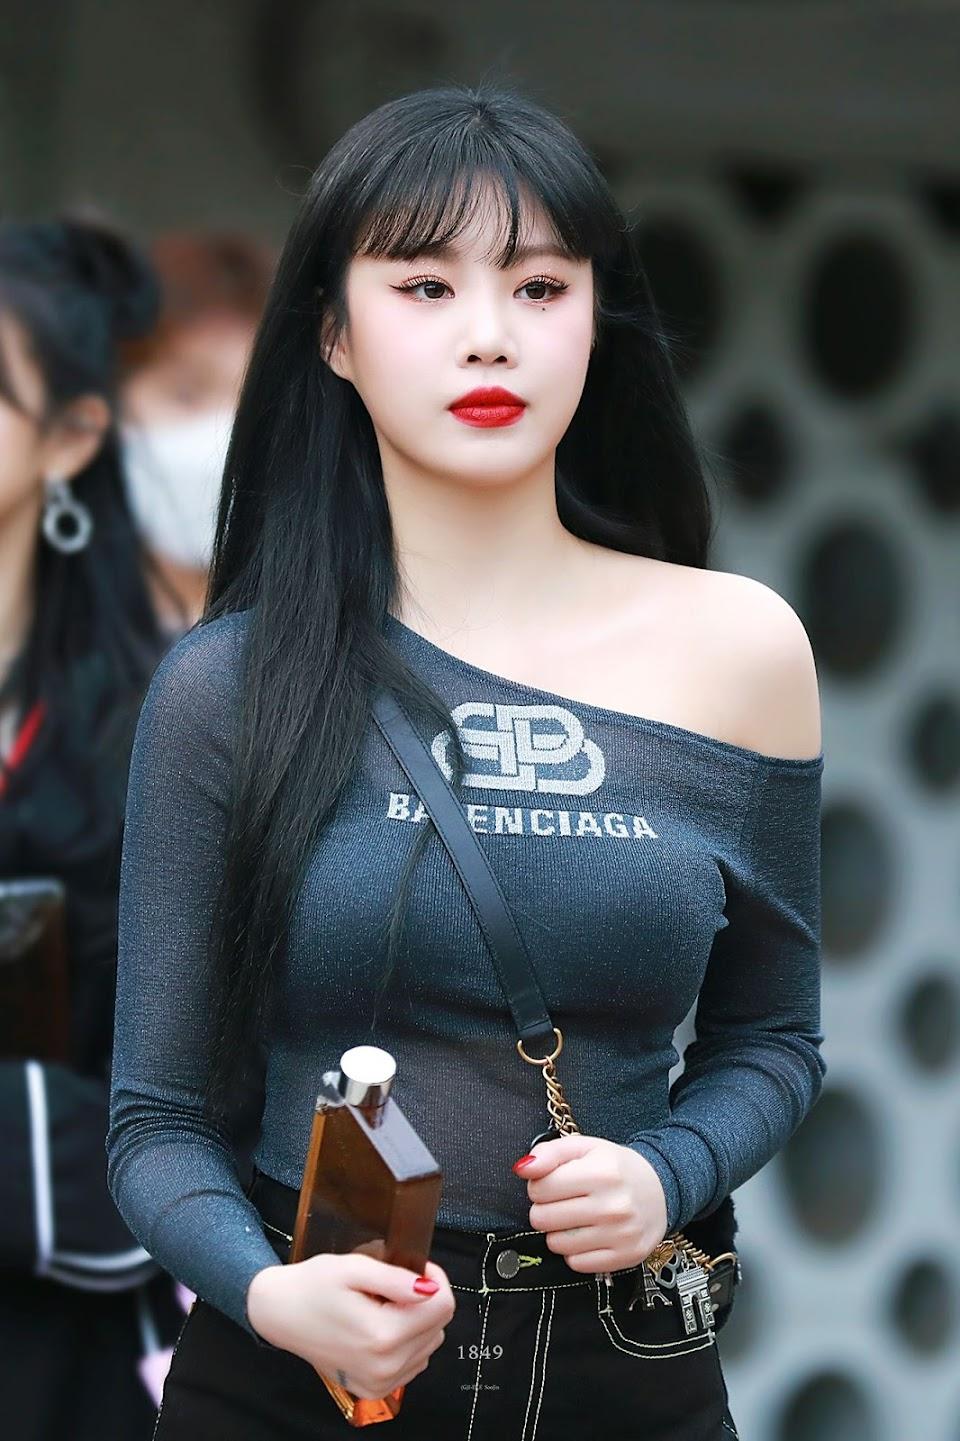 soojin body 23